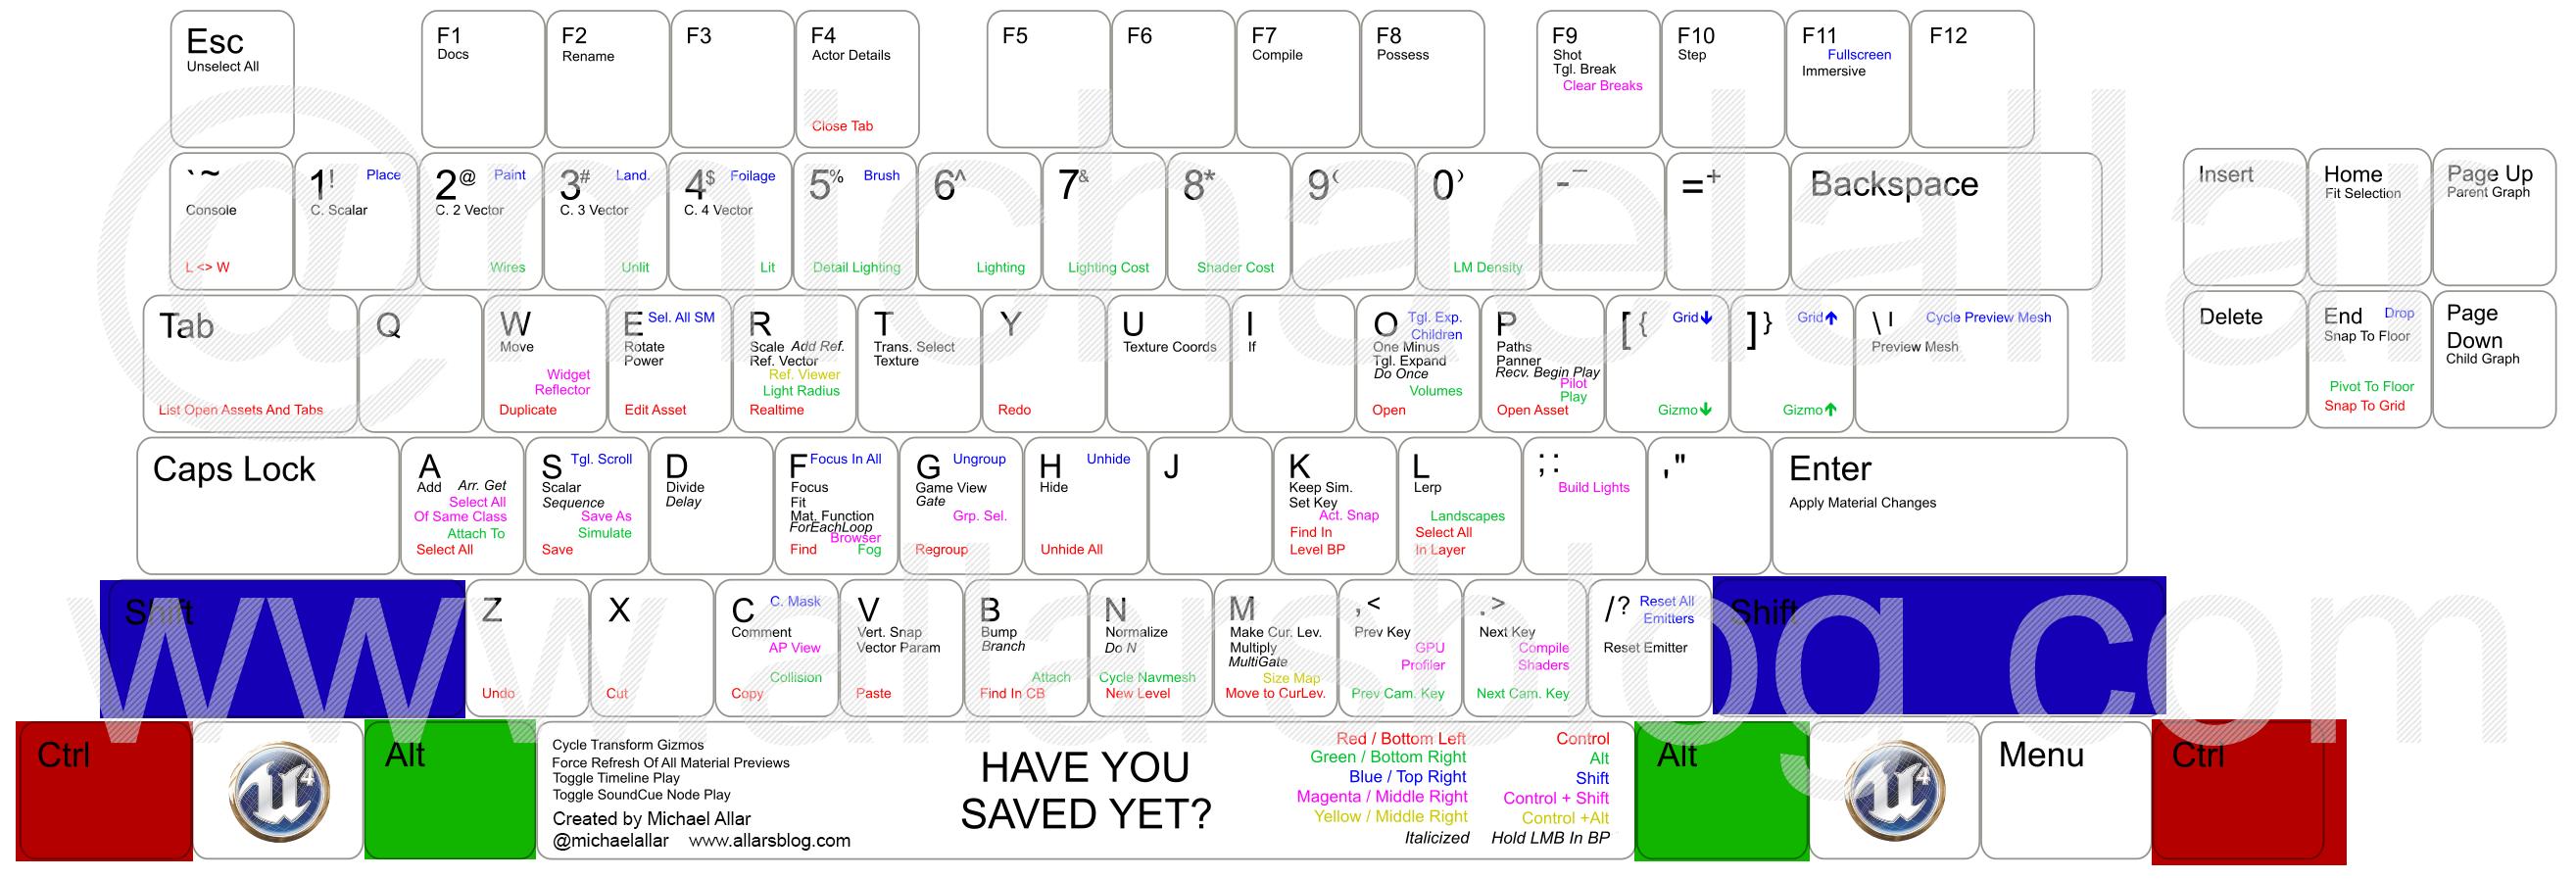 Tool Keyboard Shortcut Guide | Unreal Engine | Keyboard